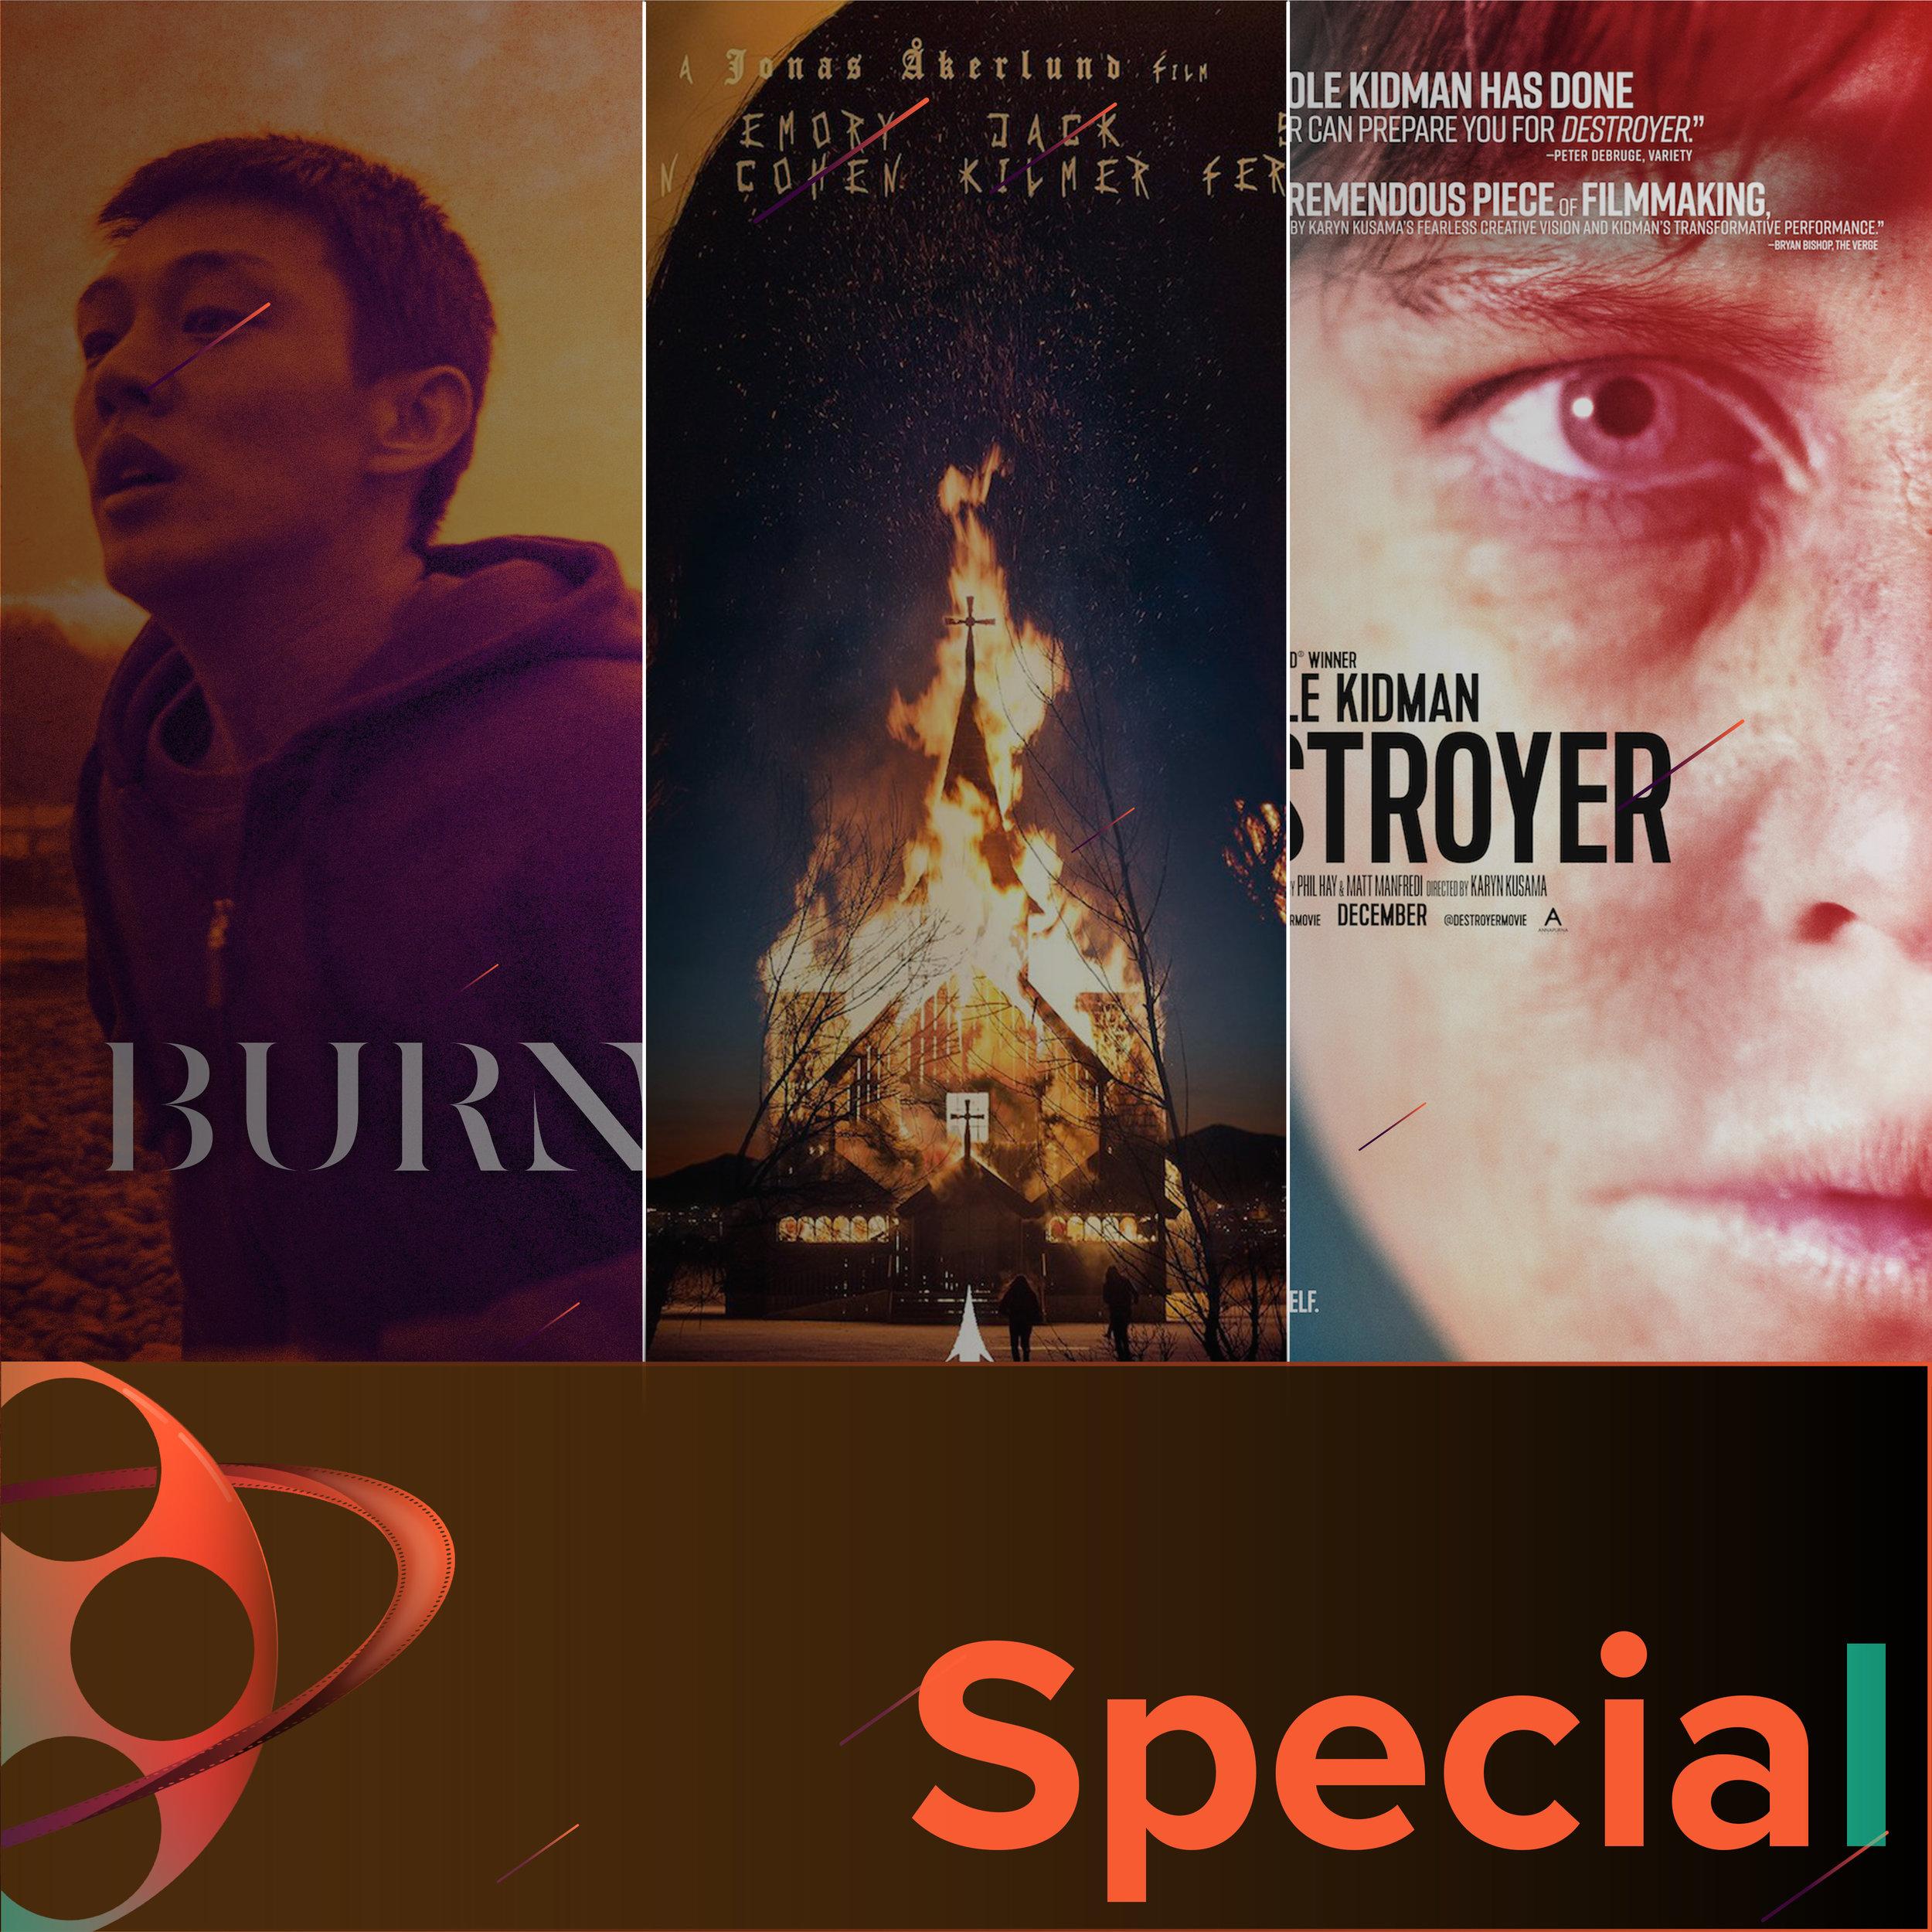 Specials_Cover_3P.jpg